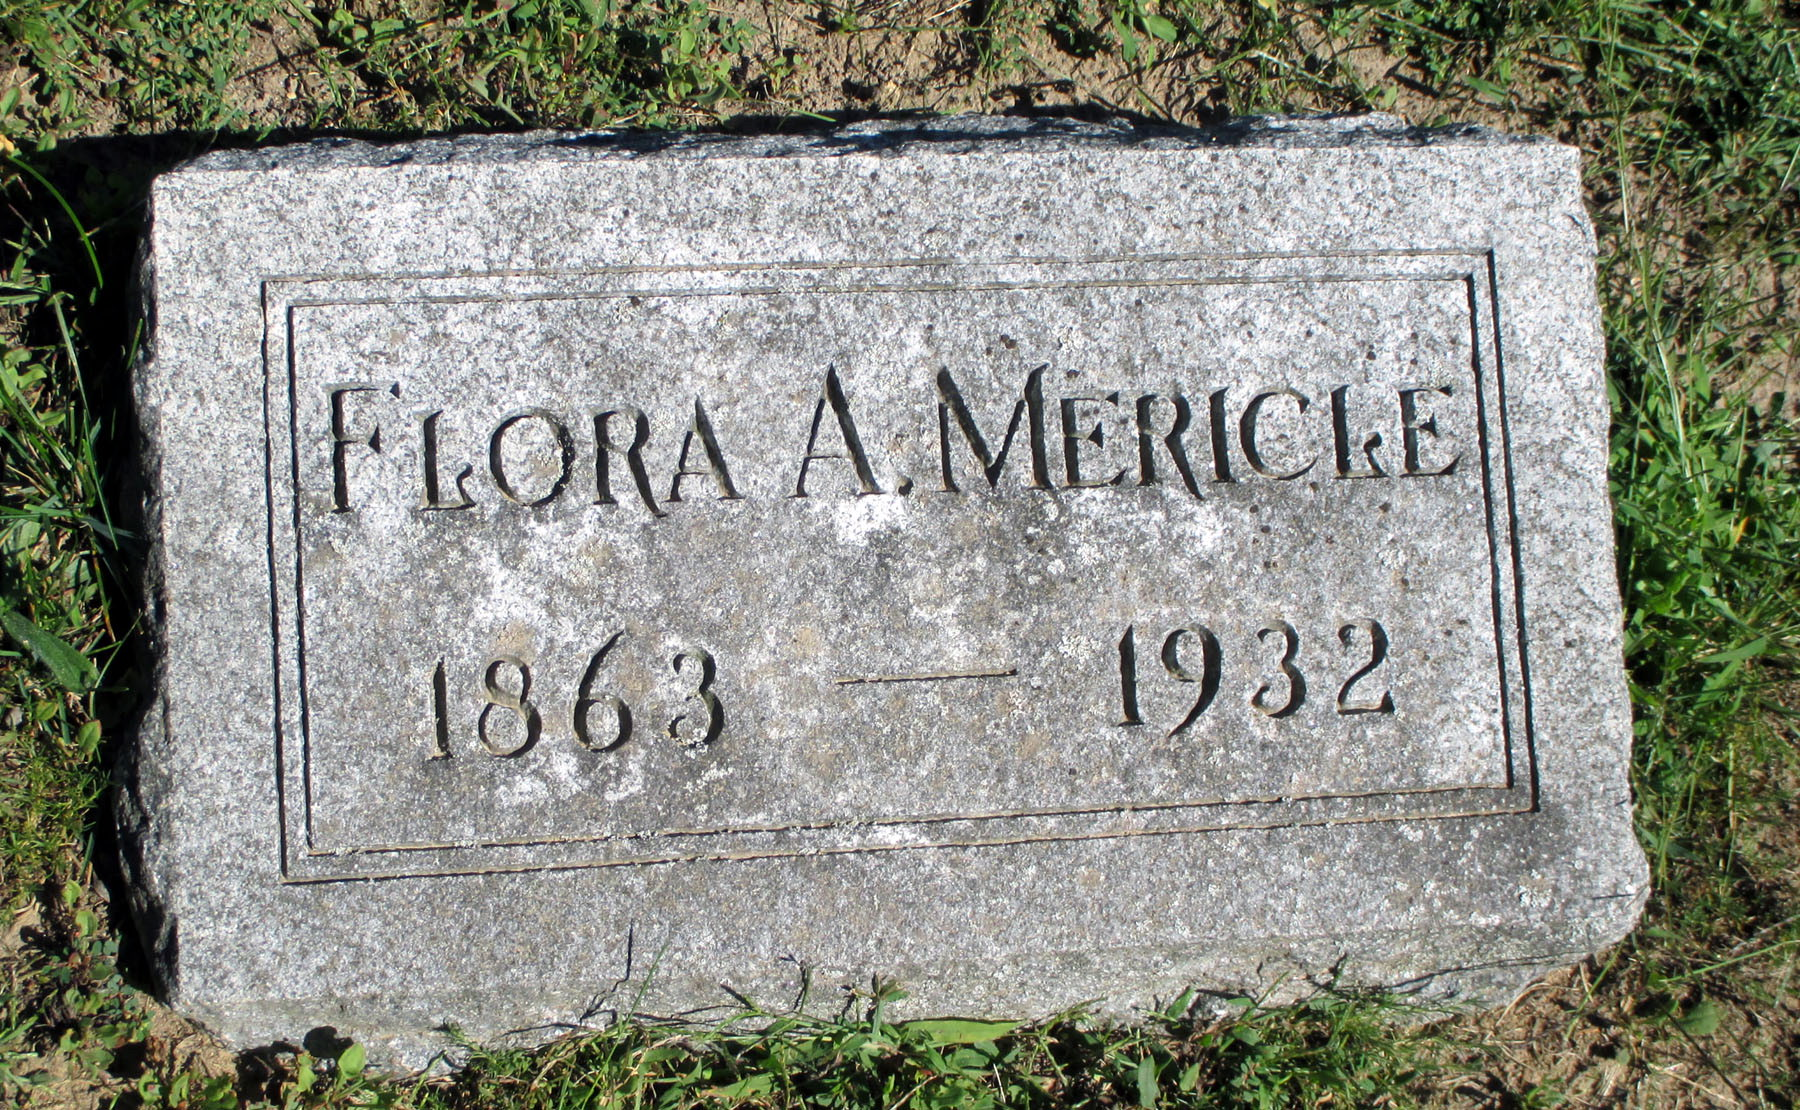 Flora Mericle